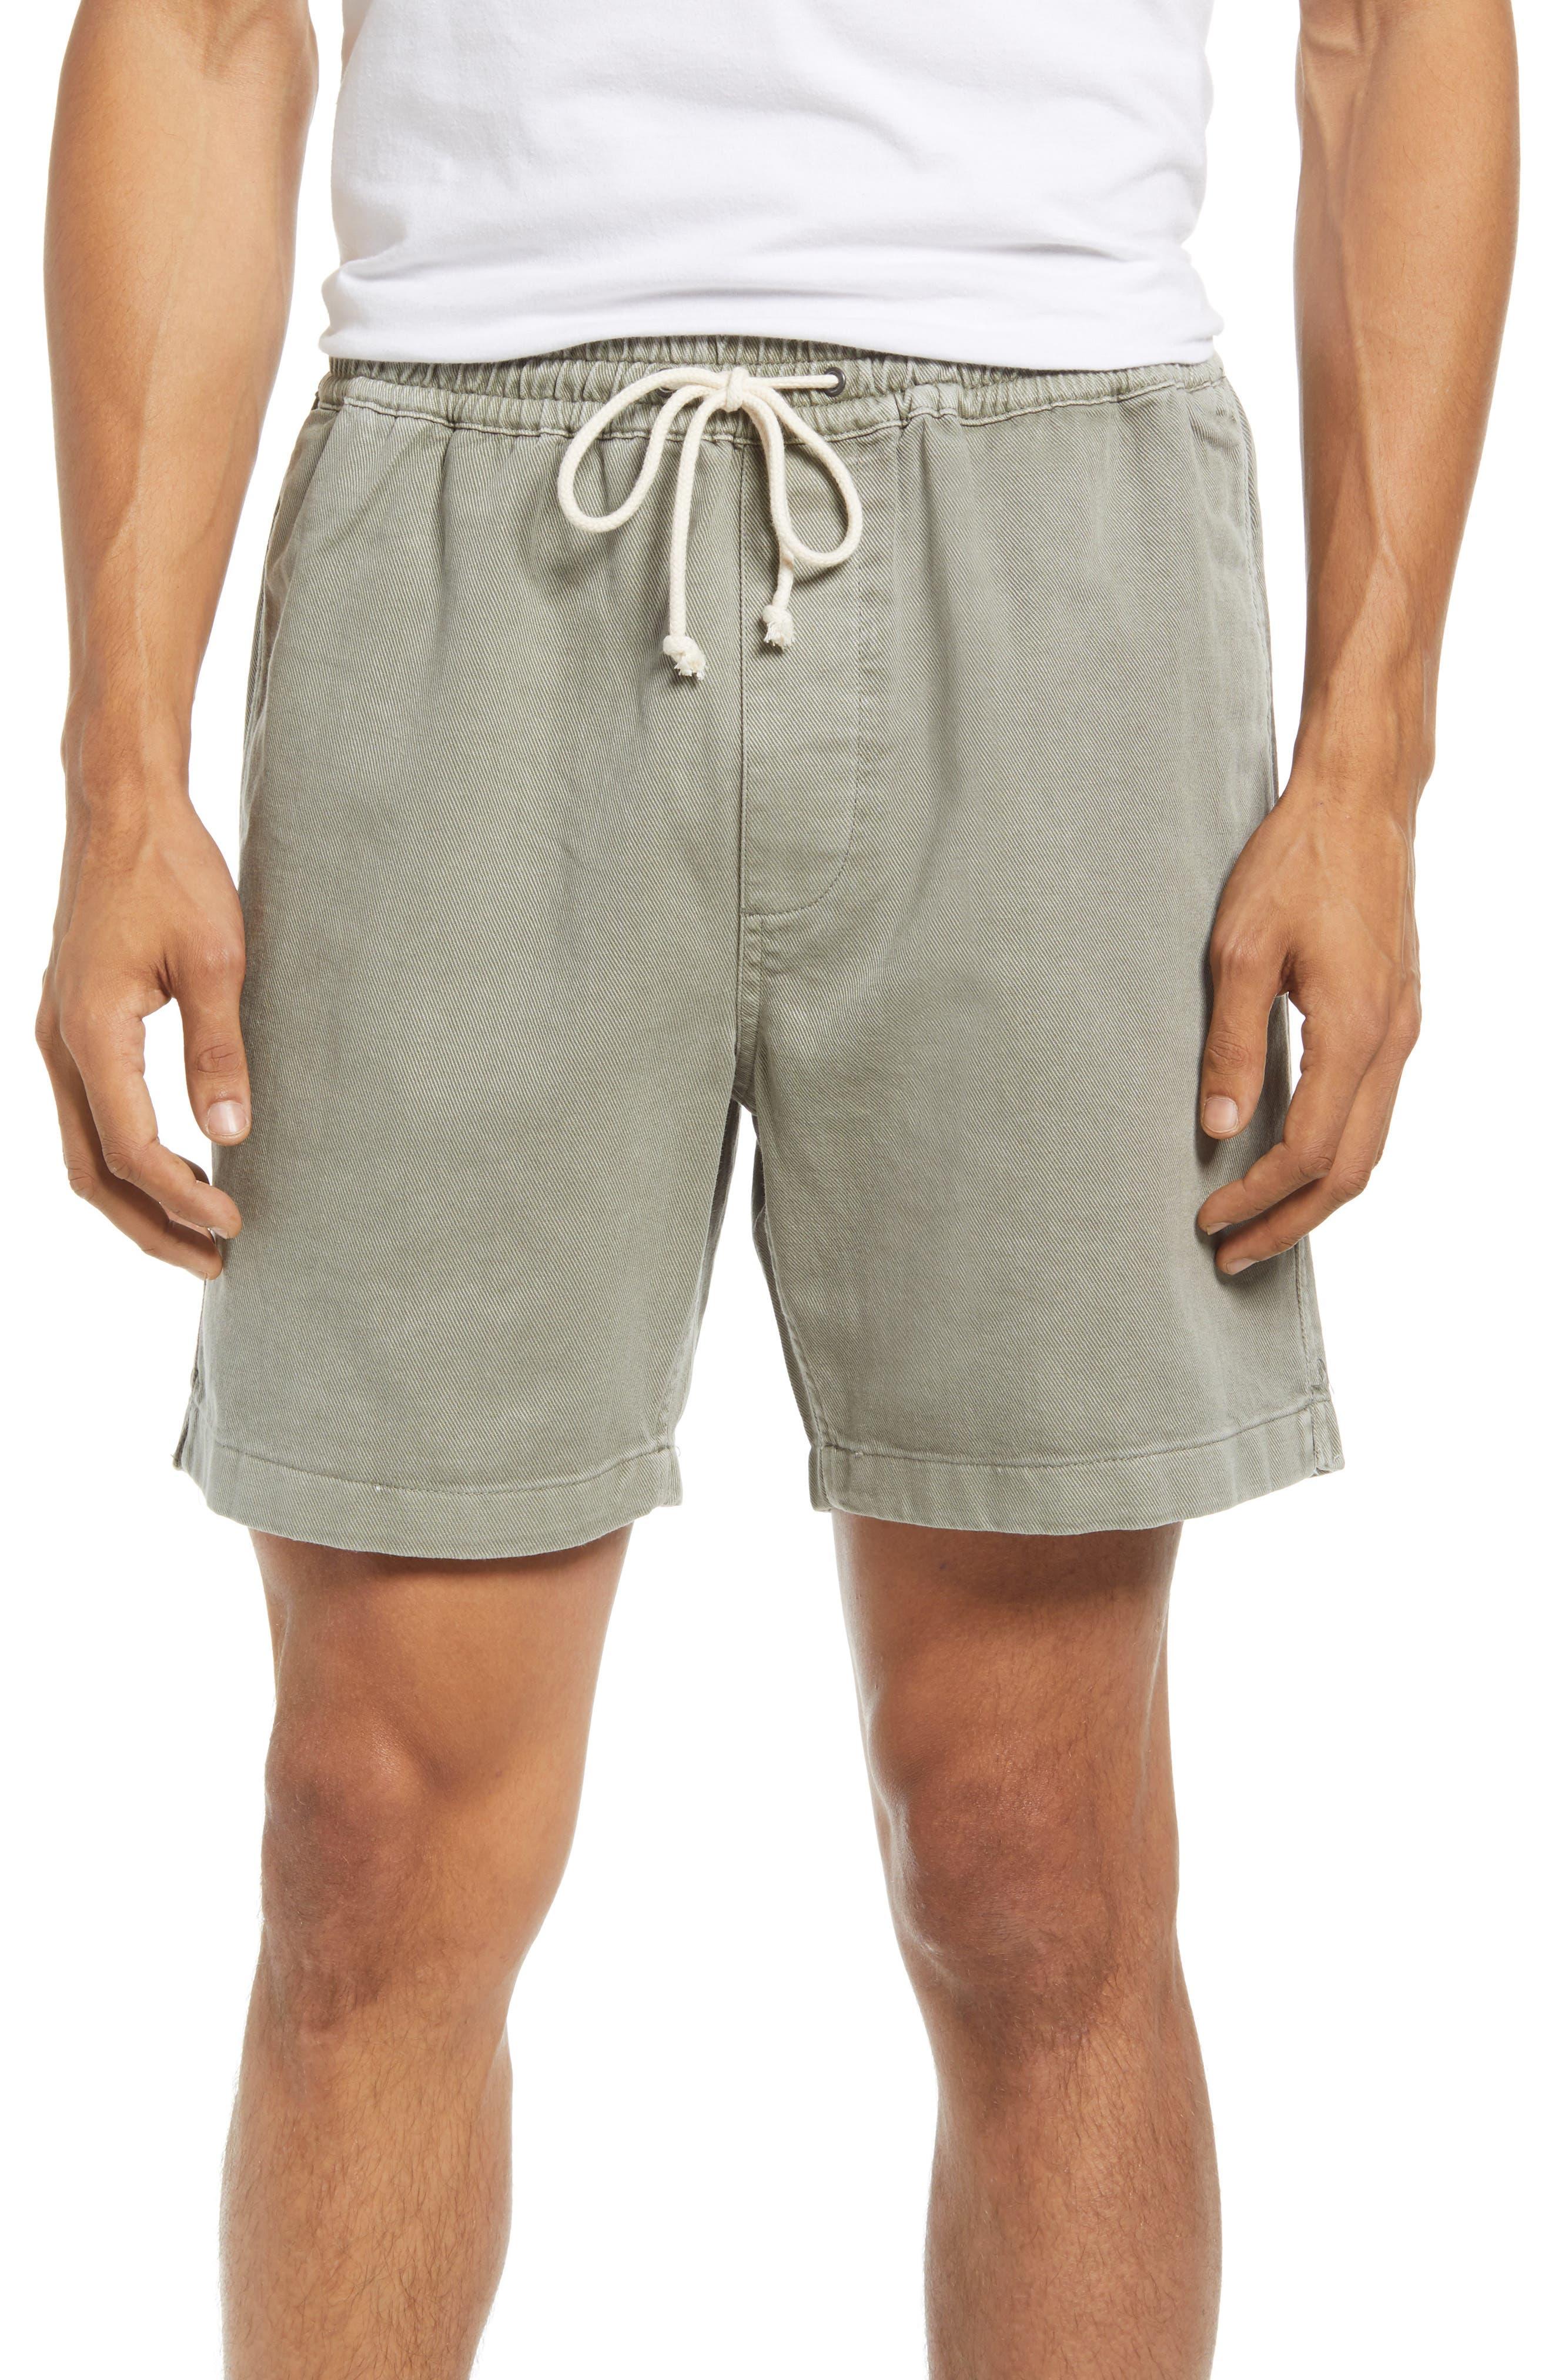 Men's Cotton Everywhere Shorts